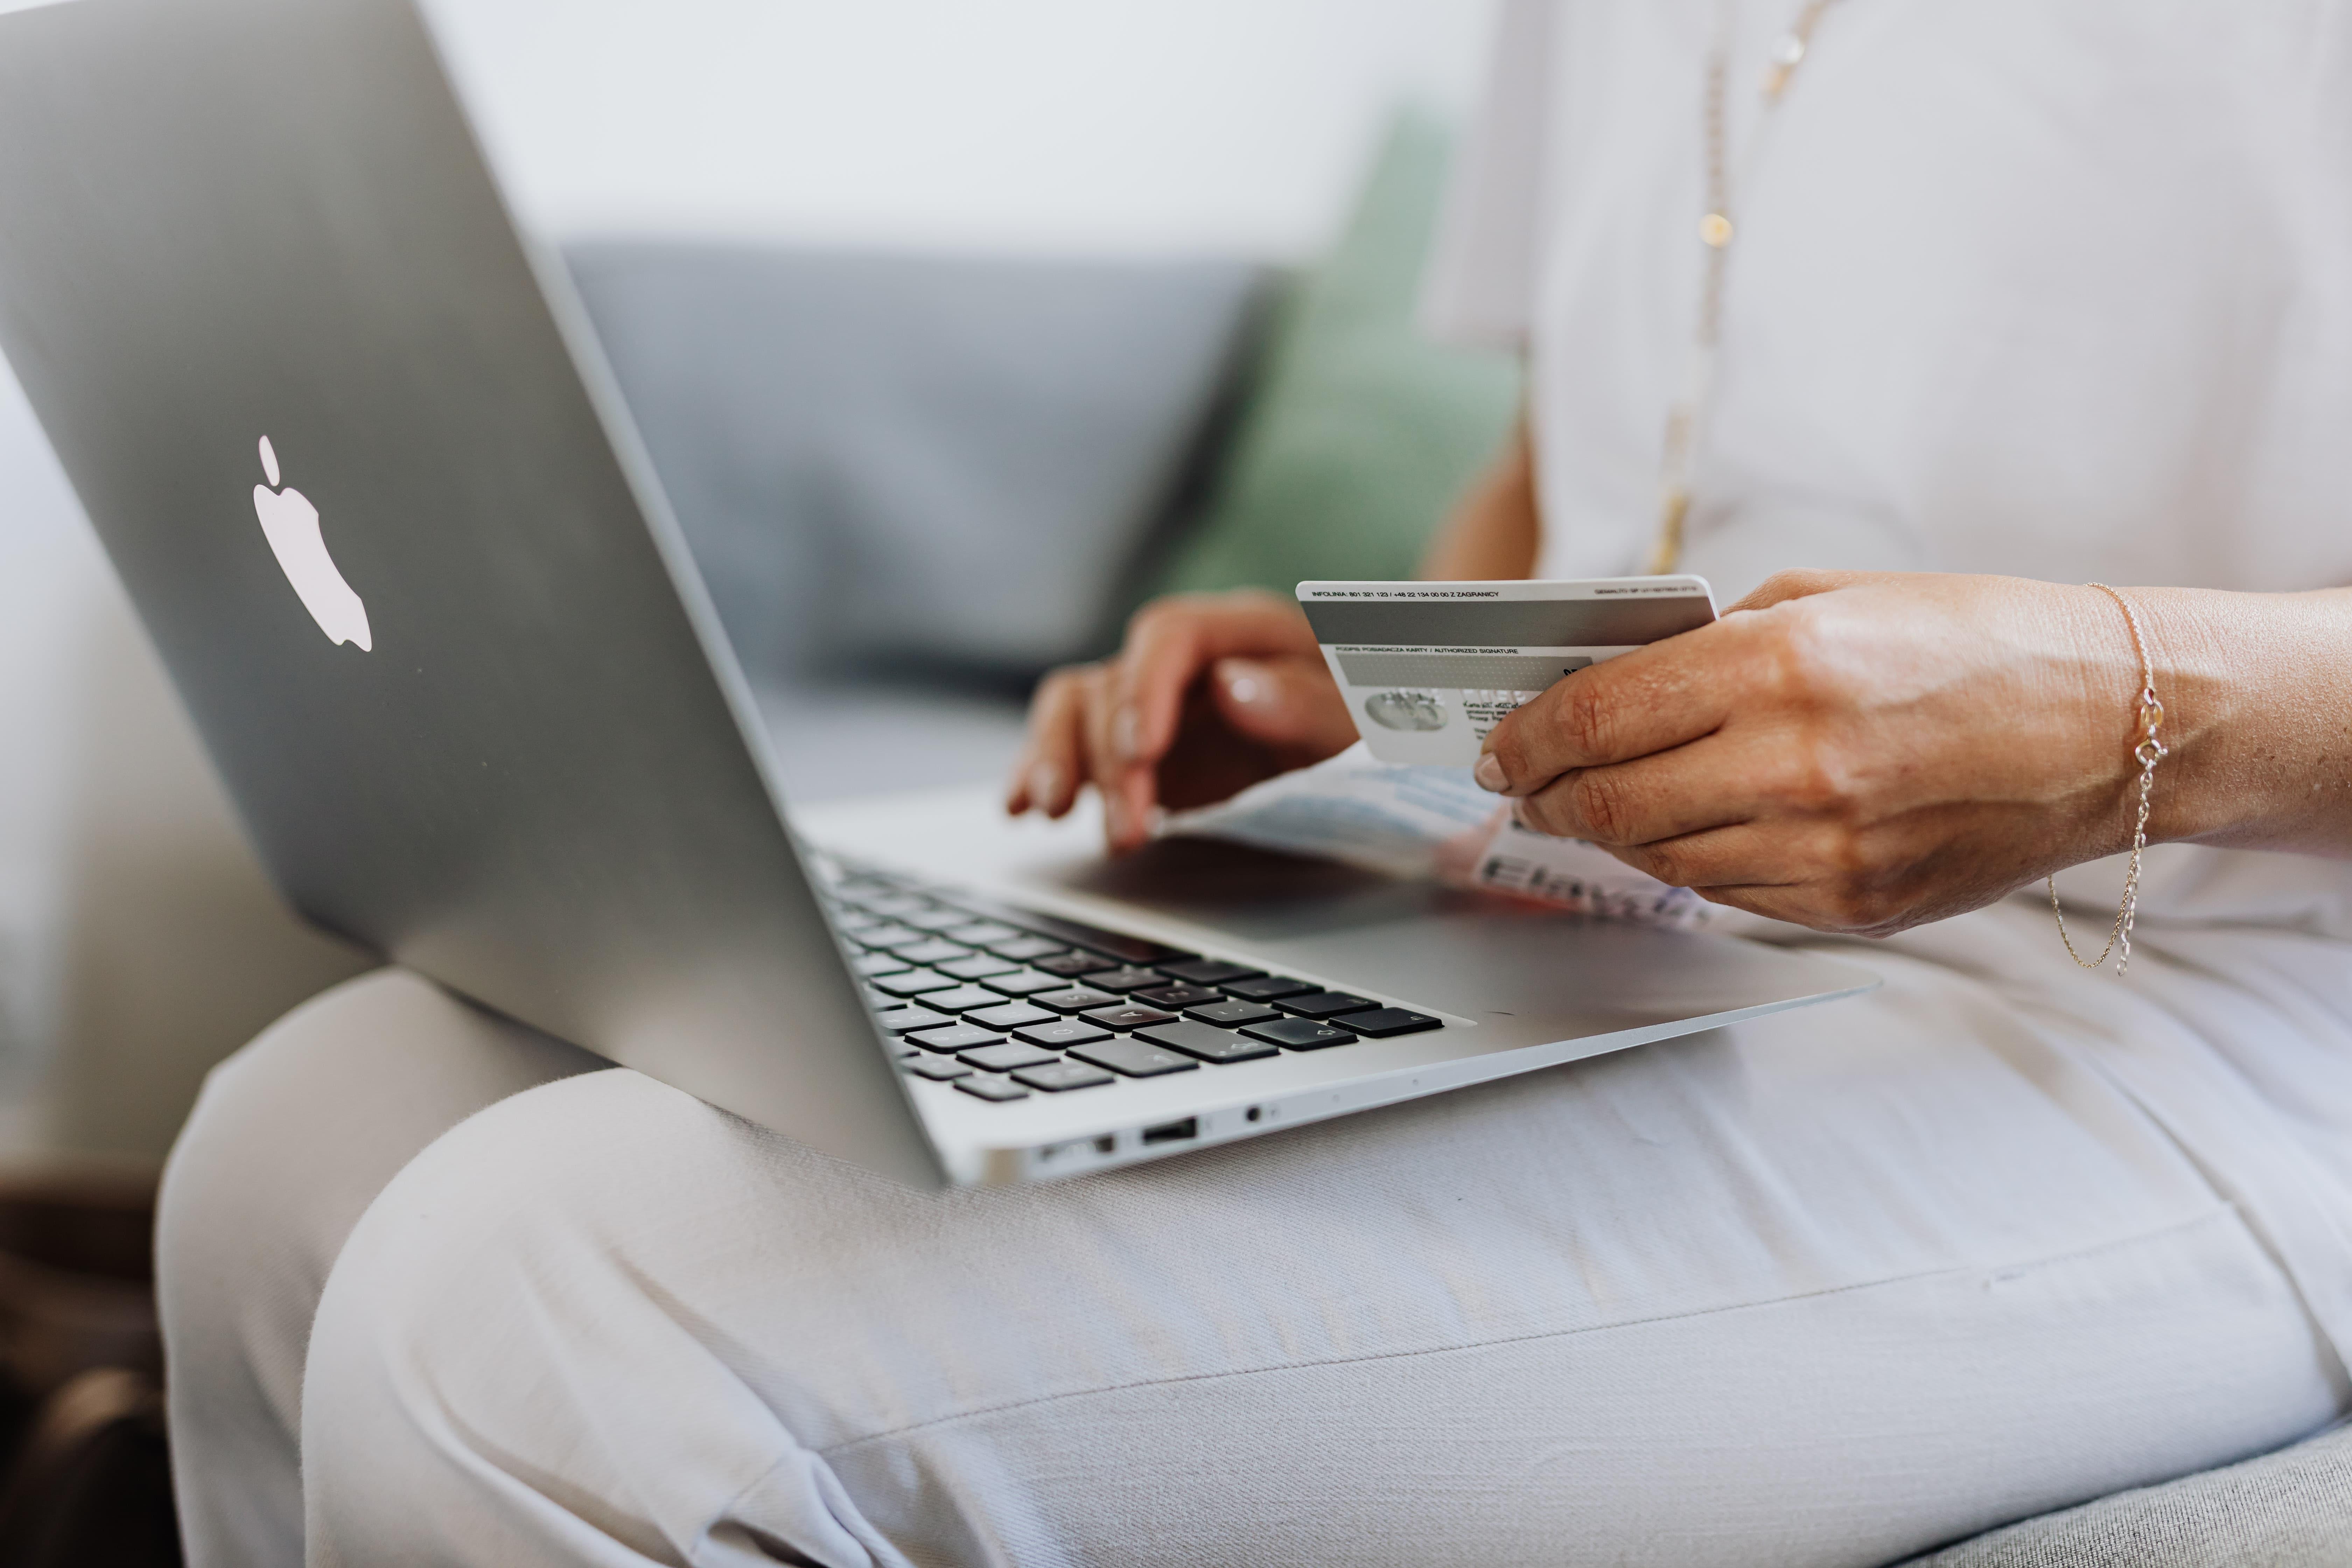 Free Virtual Debit Card from Budweiser